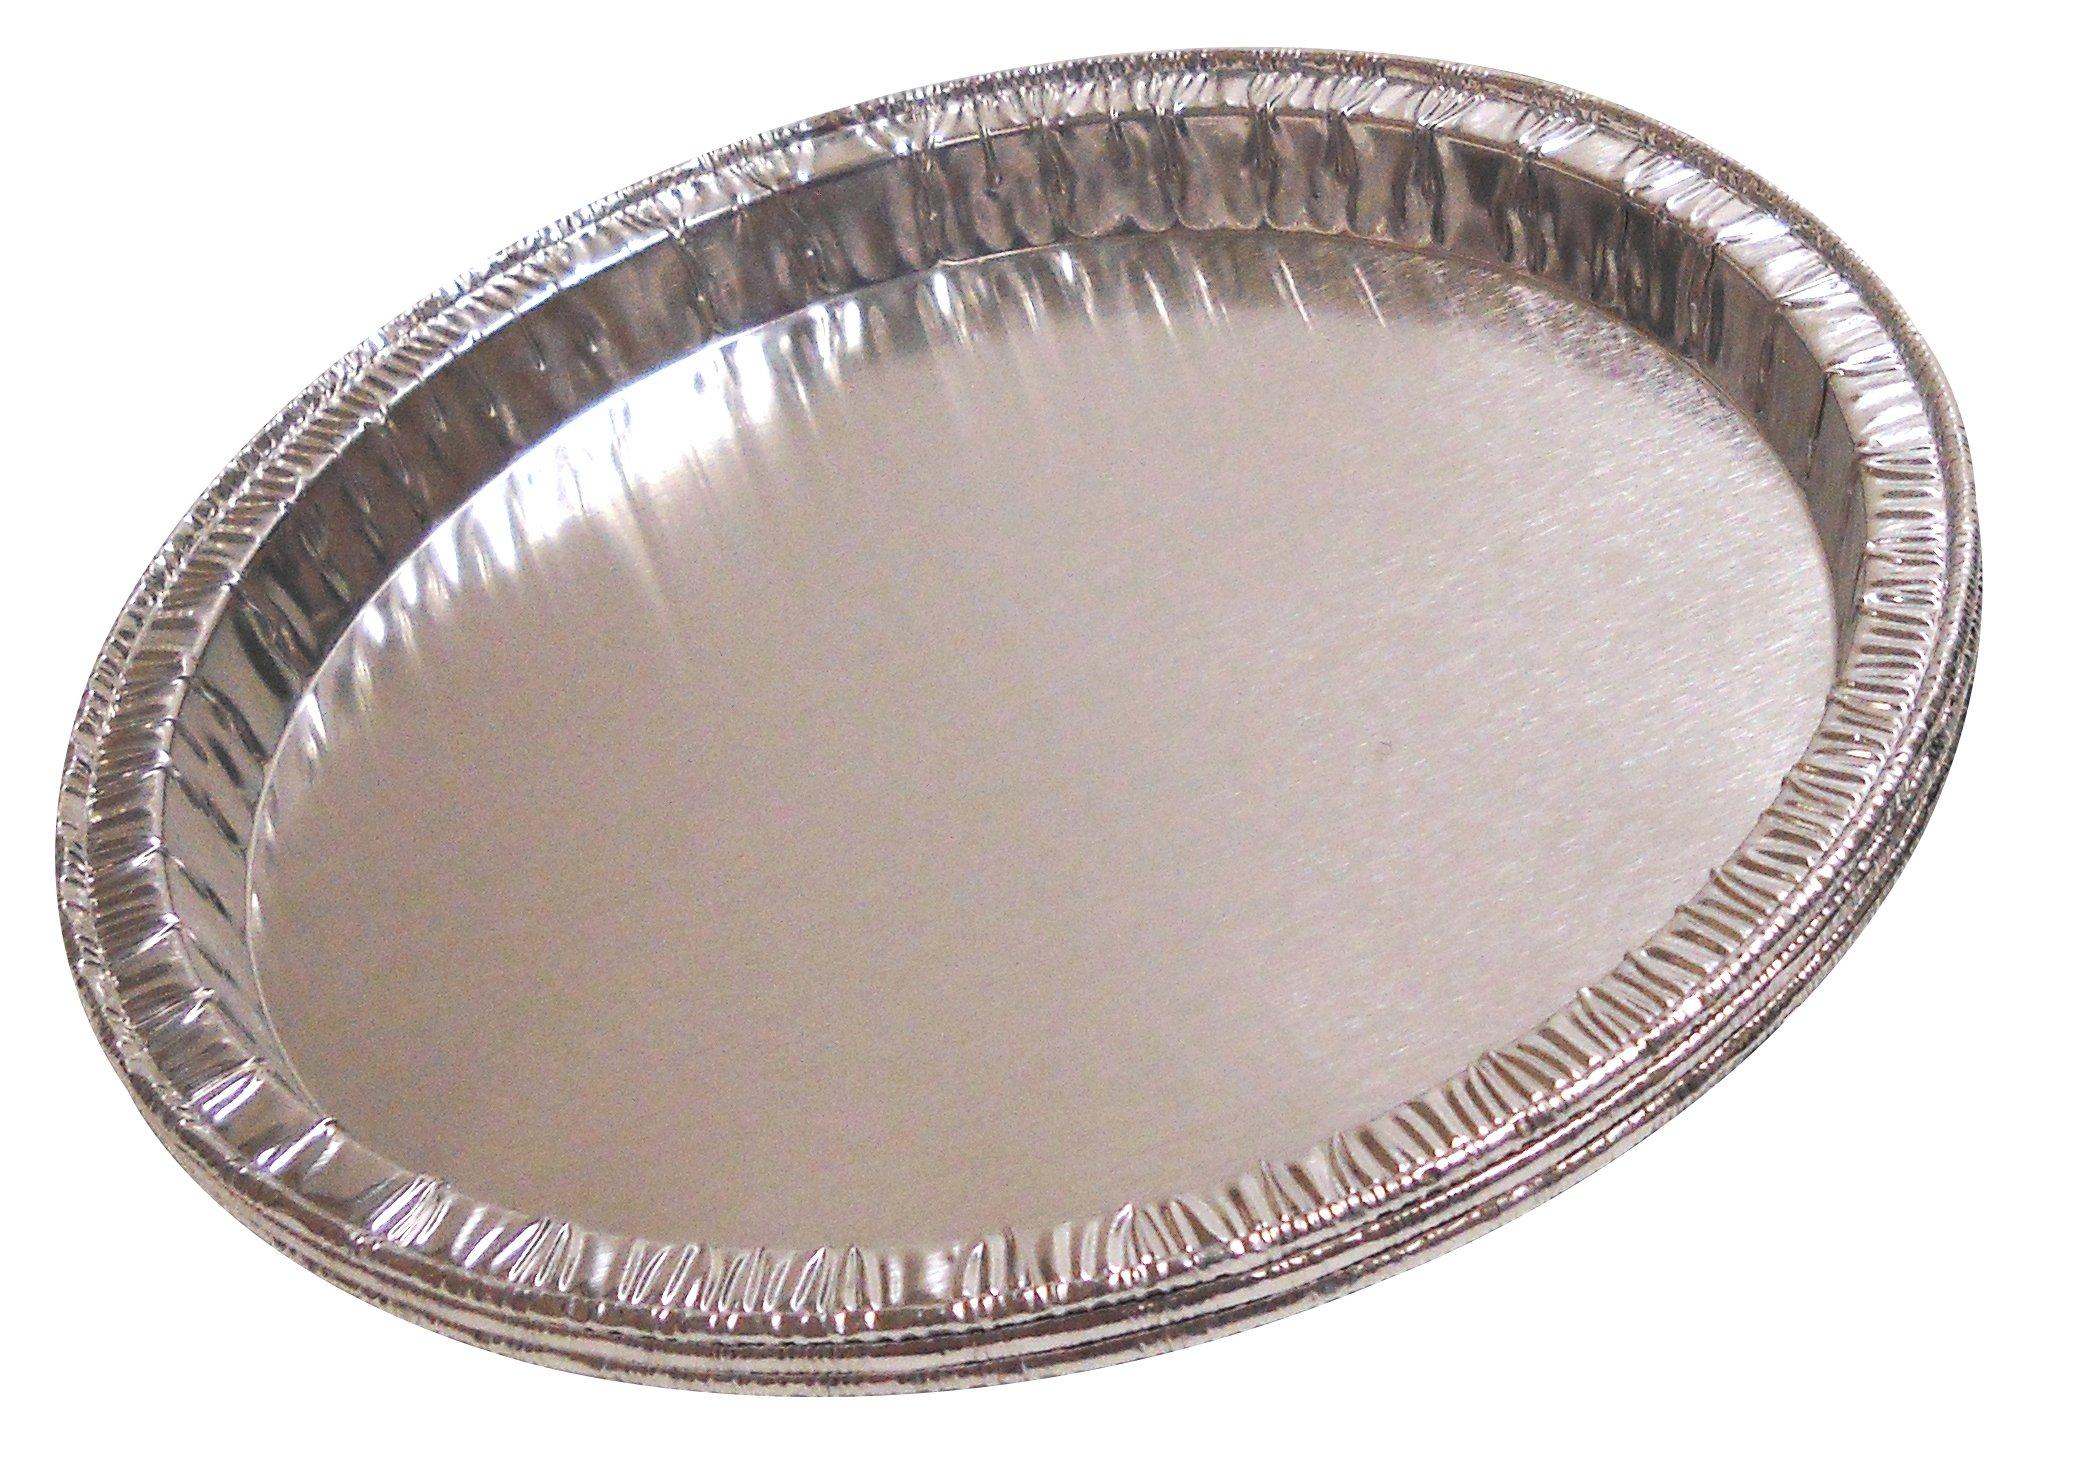 Qorpak 234795 Disposable Aluminum Moisture Balance Pan, 5'' Diameter x 3/8'' Depth (Case of 1000)